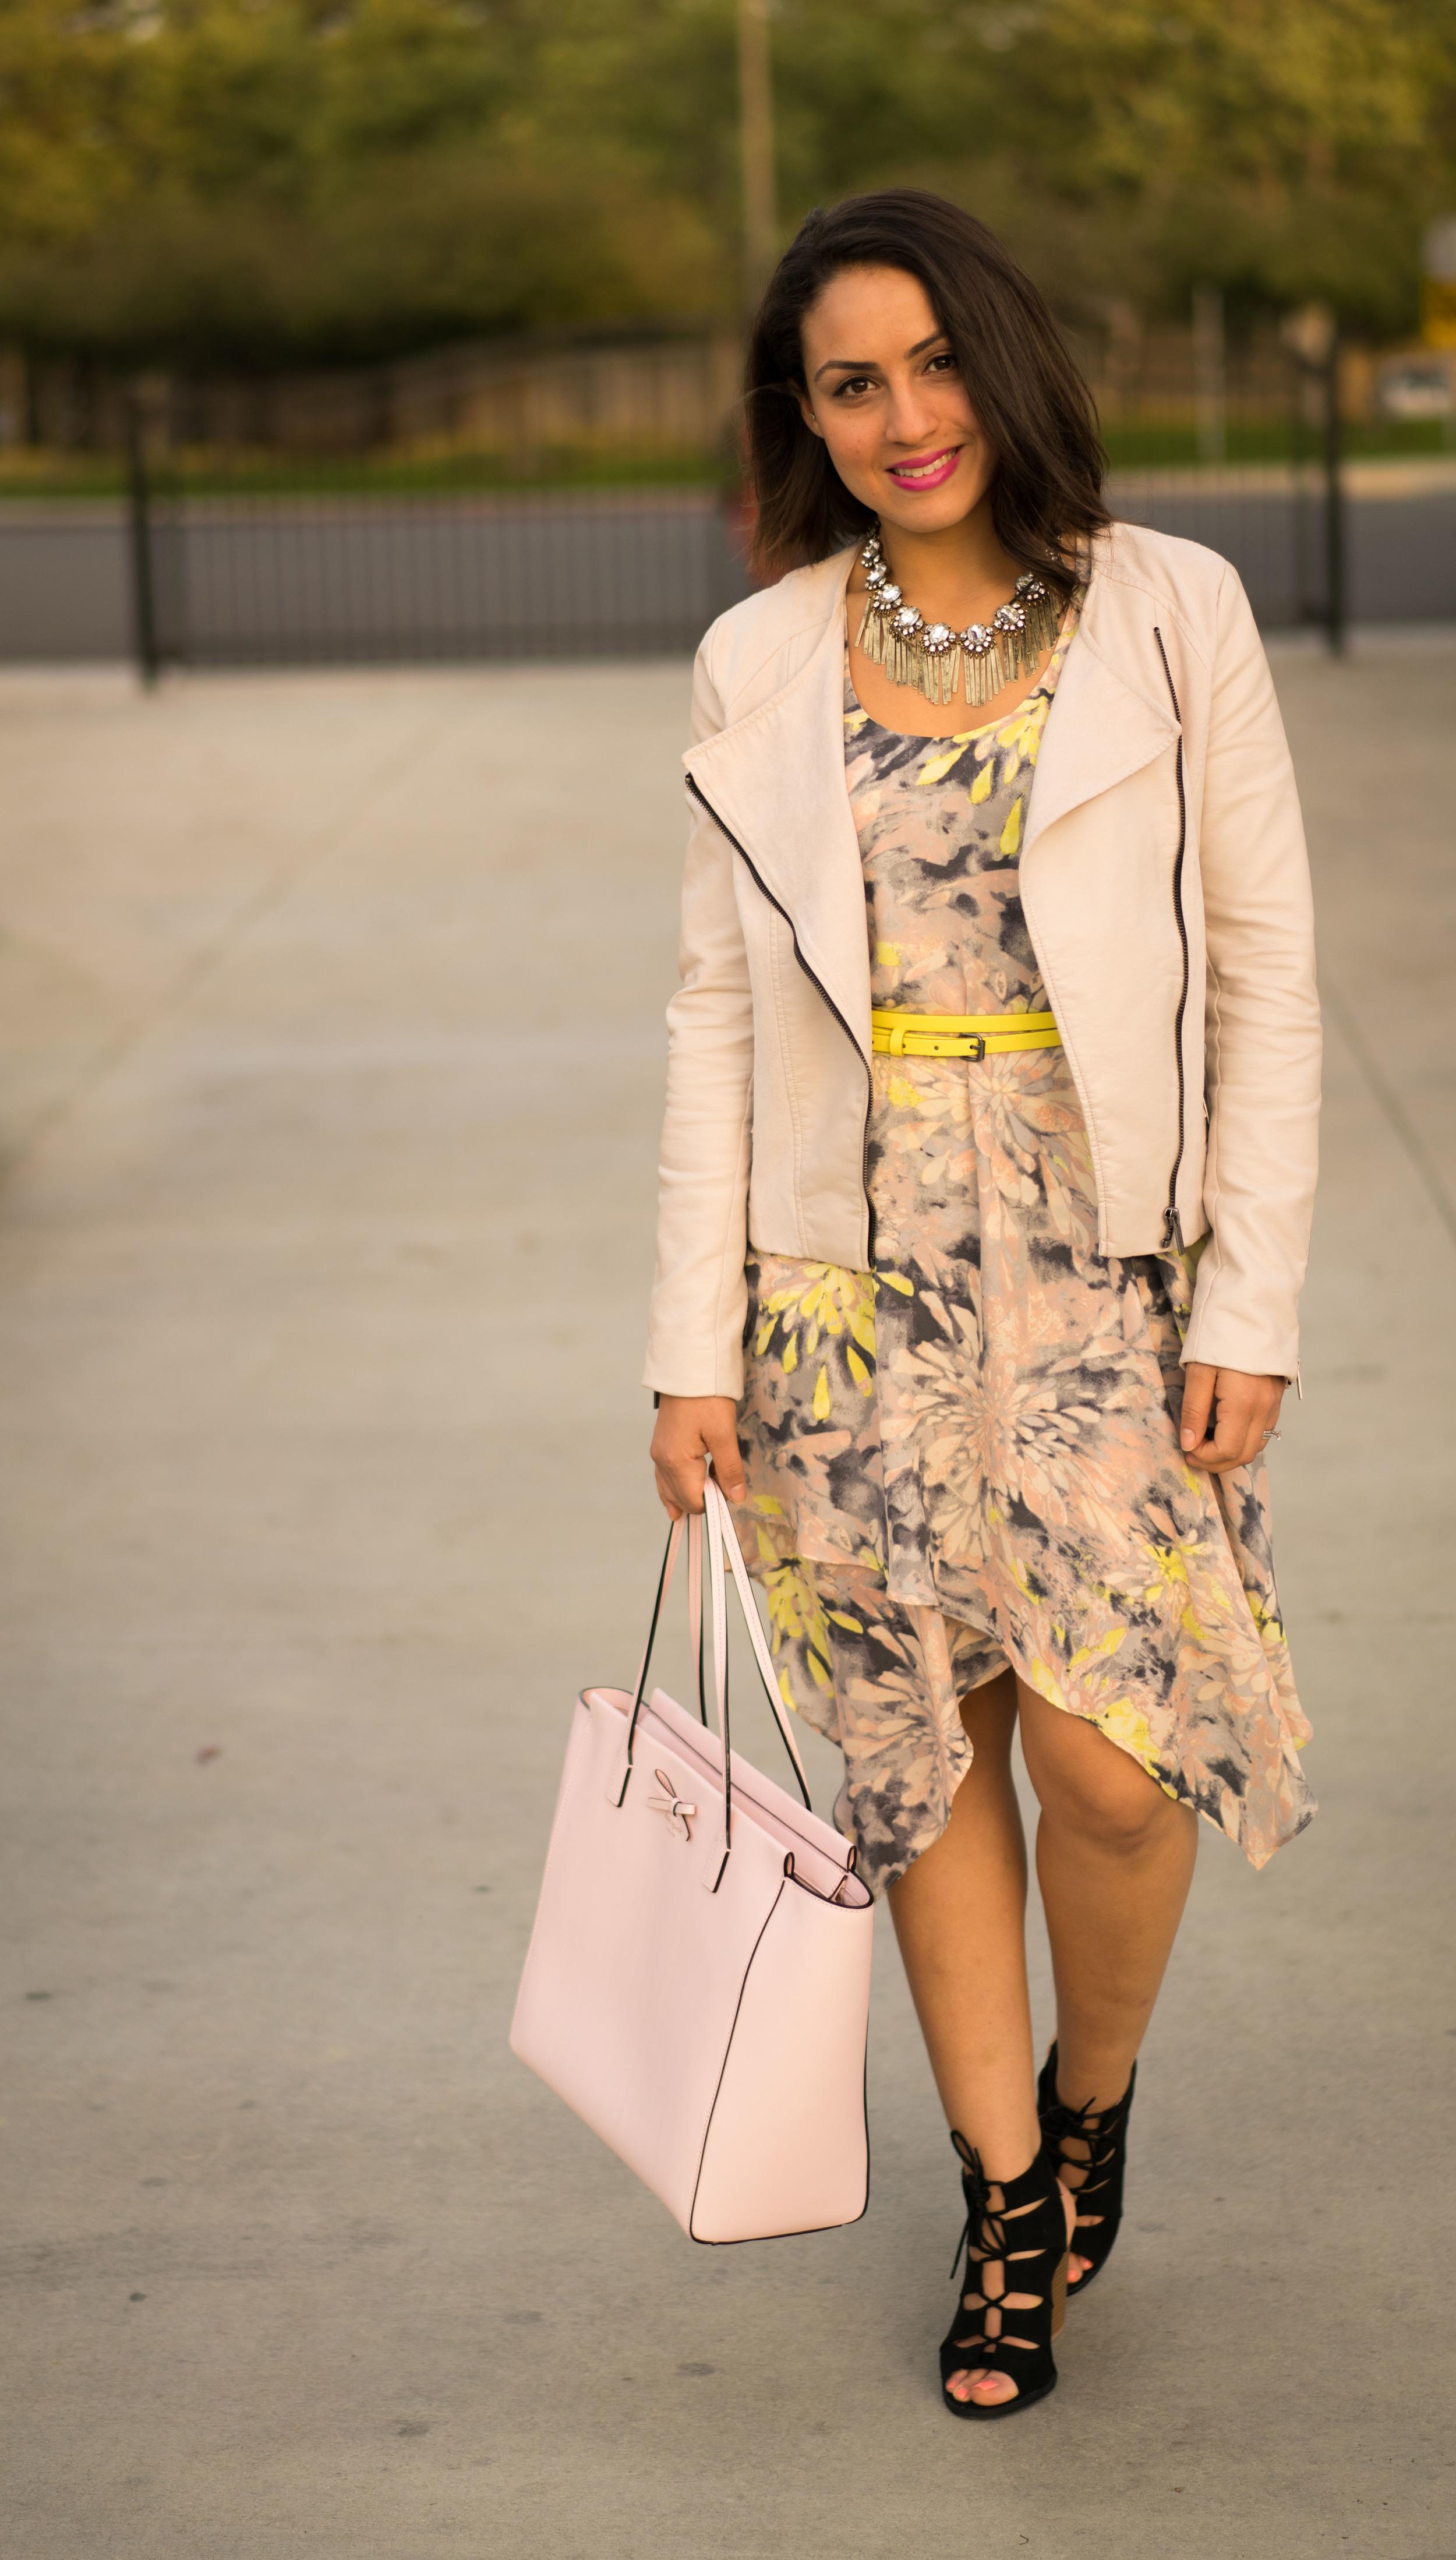 Floral Dress-00095.jpg